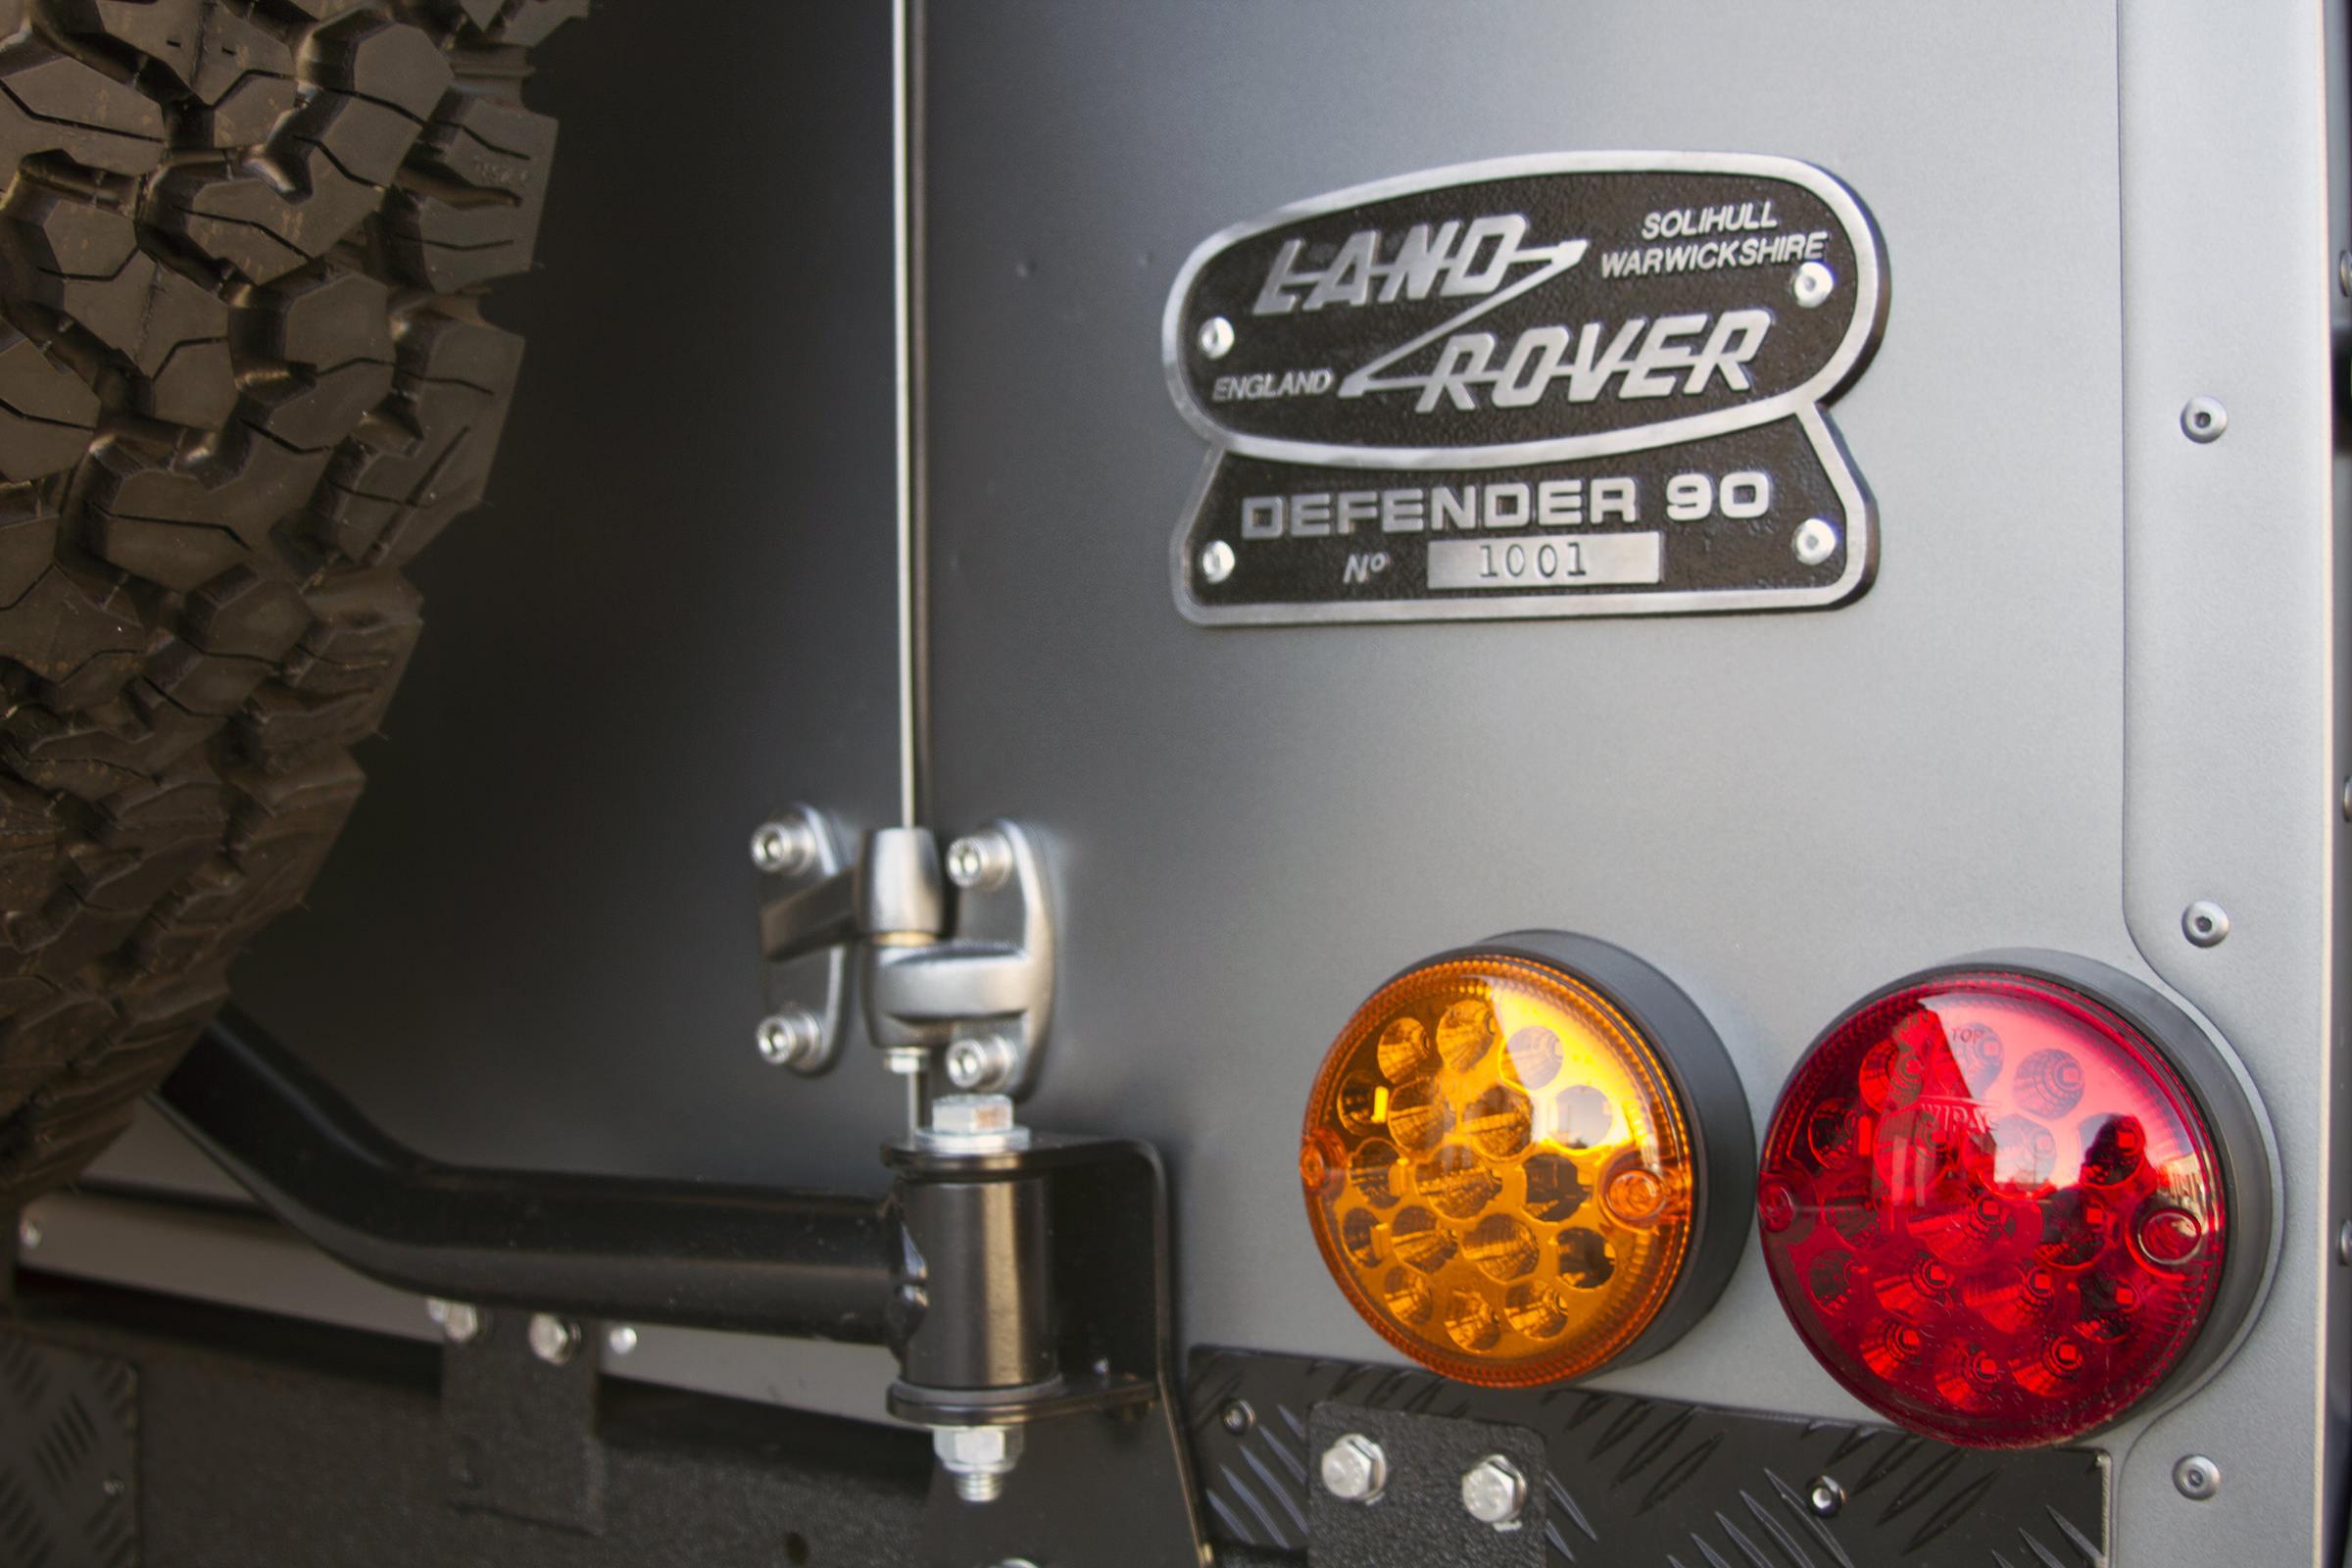 Ranger rover Land Rover Defender Millenium Falcon